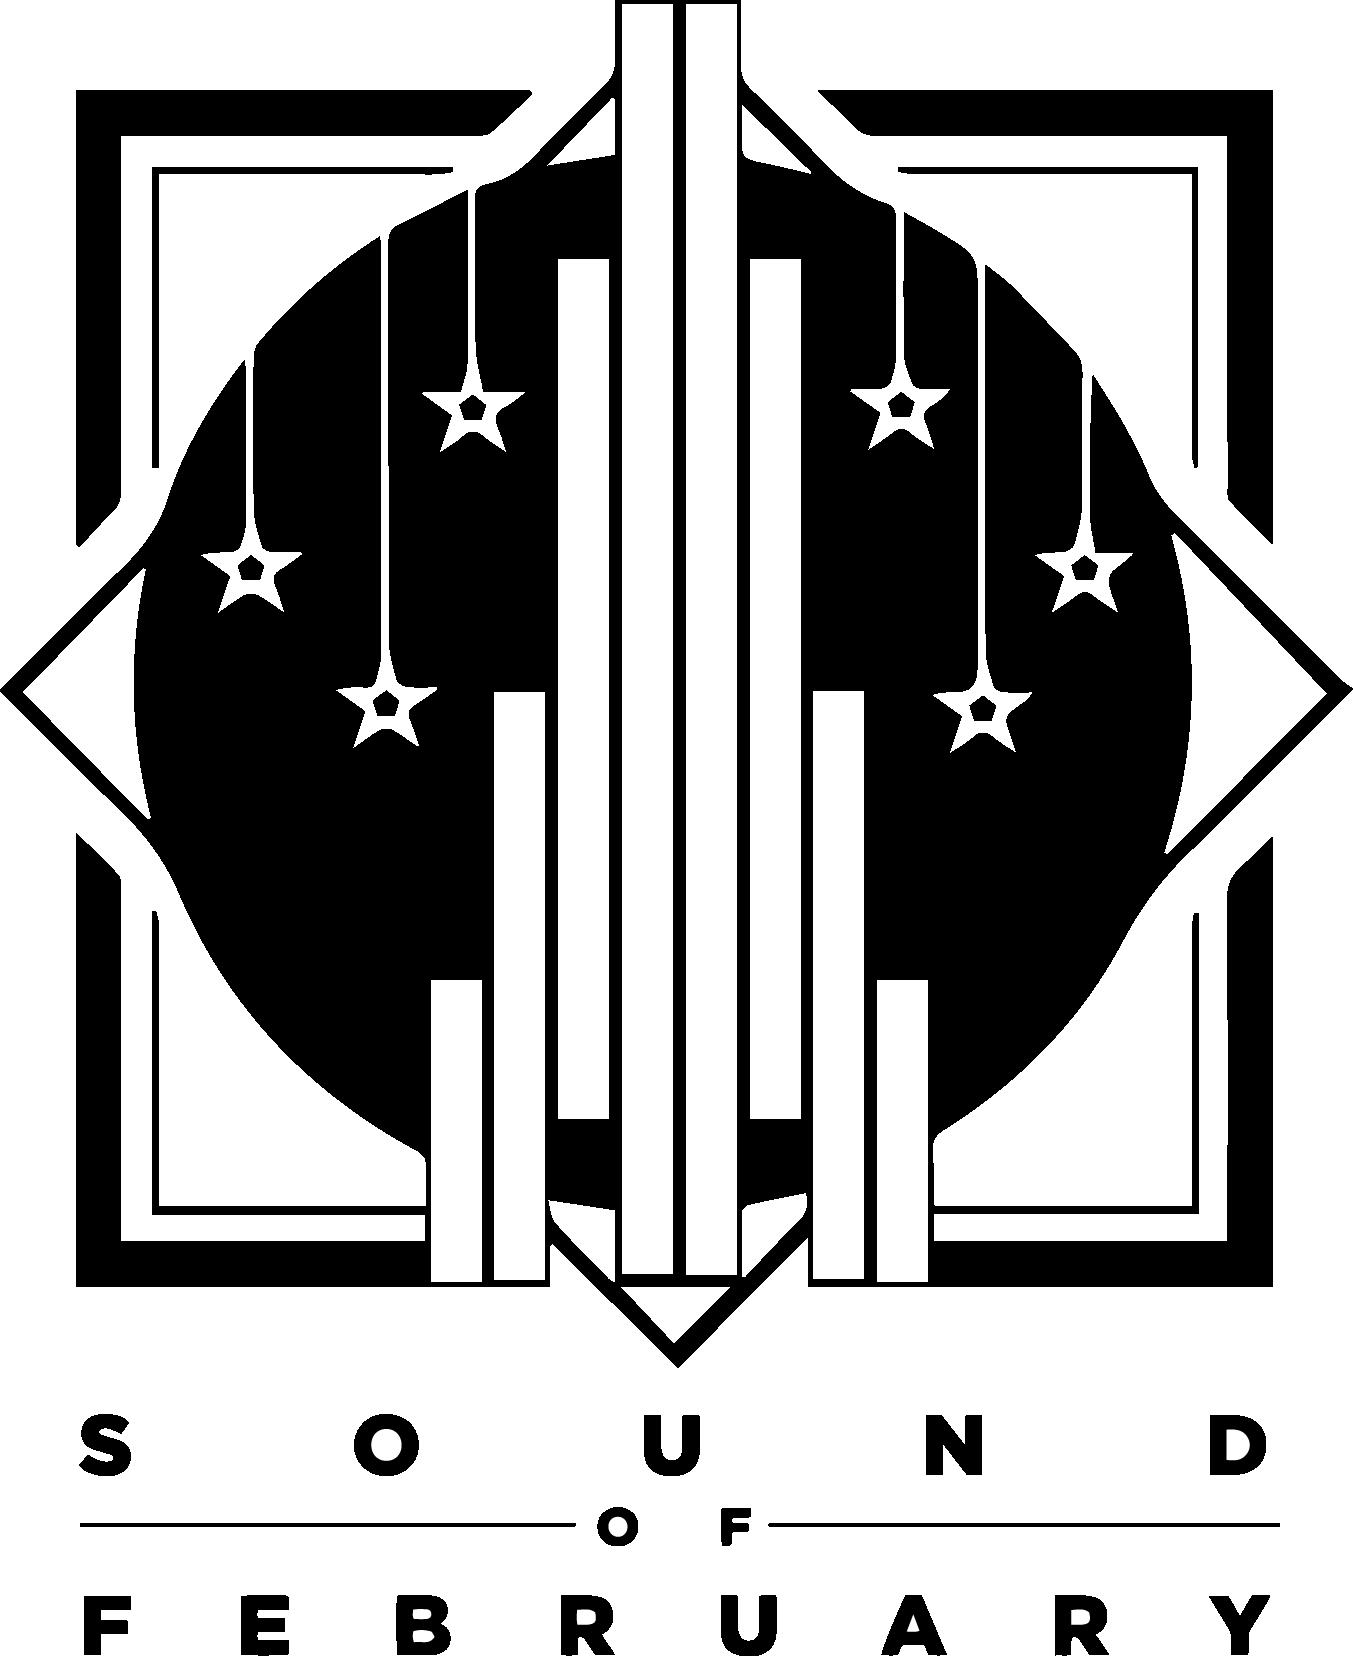 Sound Of February Logo